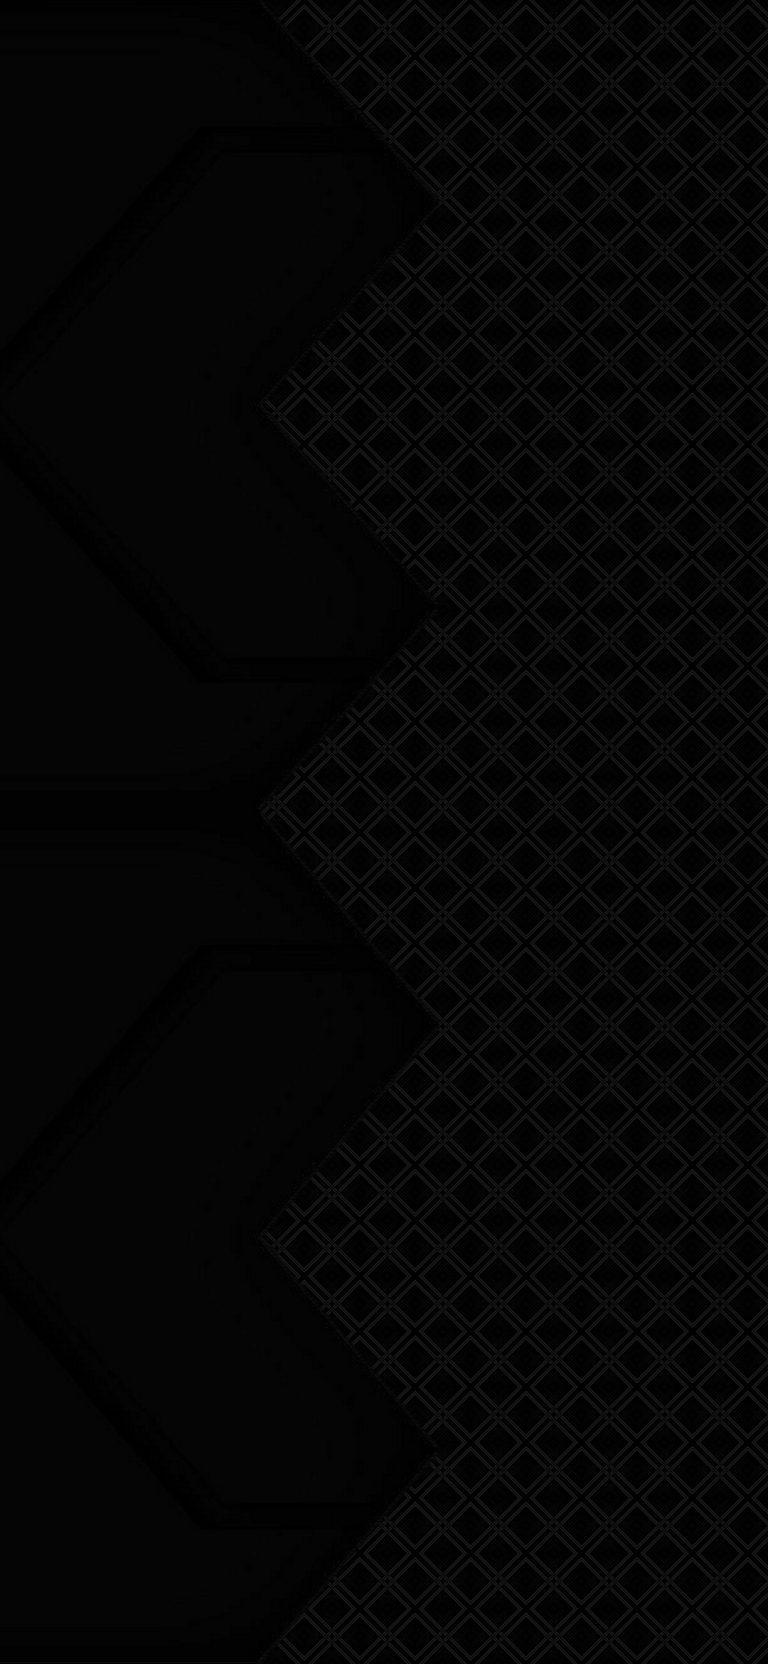 Amoled Phone Wallpaper 003 1080x2340 768x1664